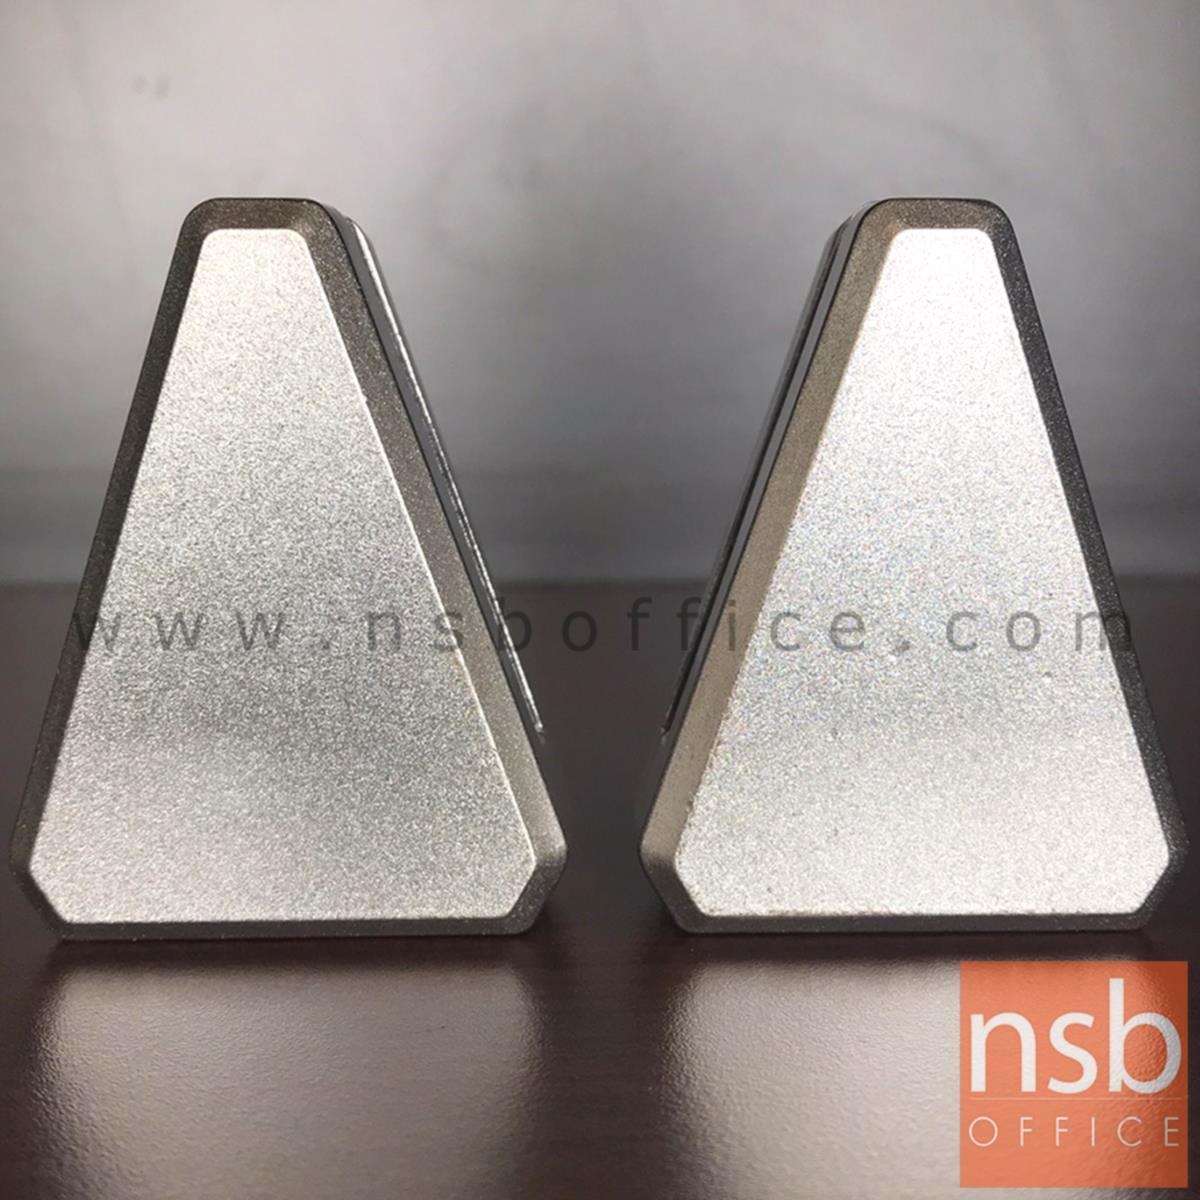 J01A018:ตัวหนีบ miniscreen แบบเจาะ รุ่น FERRARI (เฟอรารี่) ทรงสามเหลี่ยมใหญ่พิเศษ